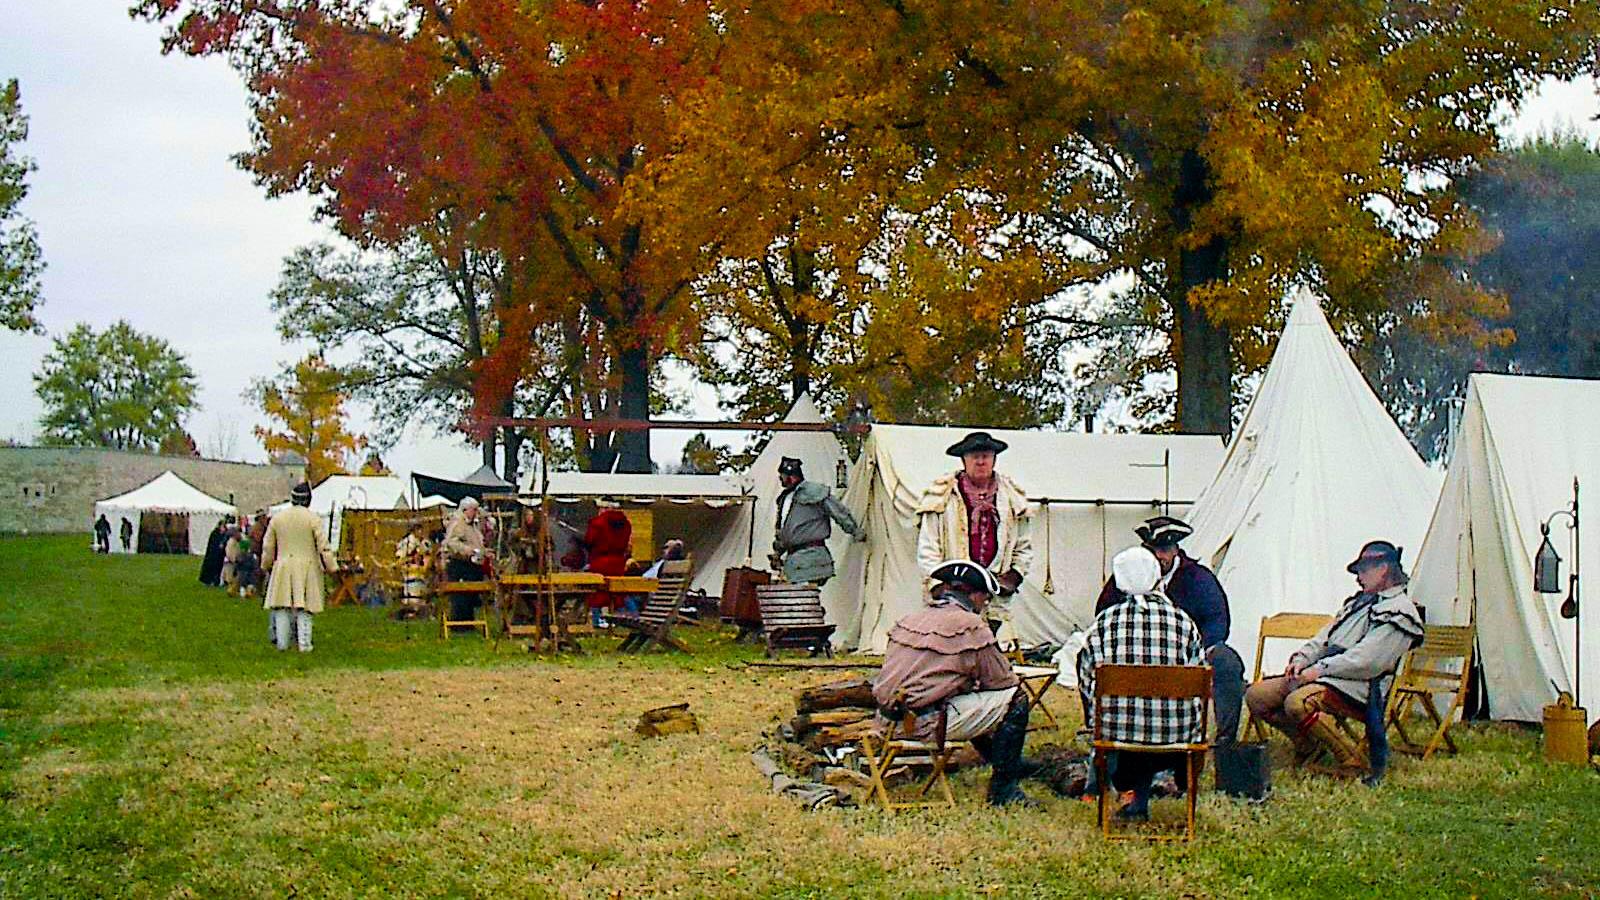 Fur trapper era reenactors Fort de Chartres, Prairie du Rocher, Illinois